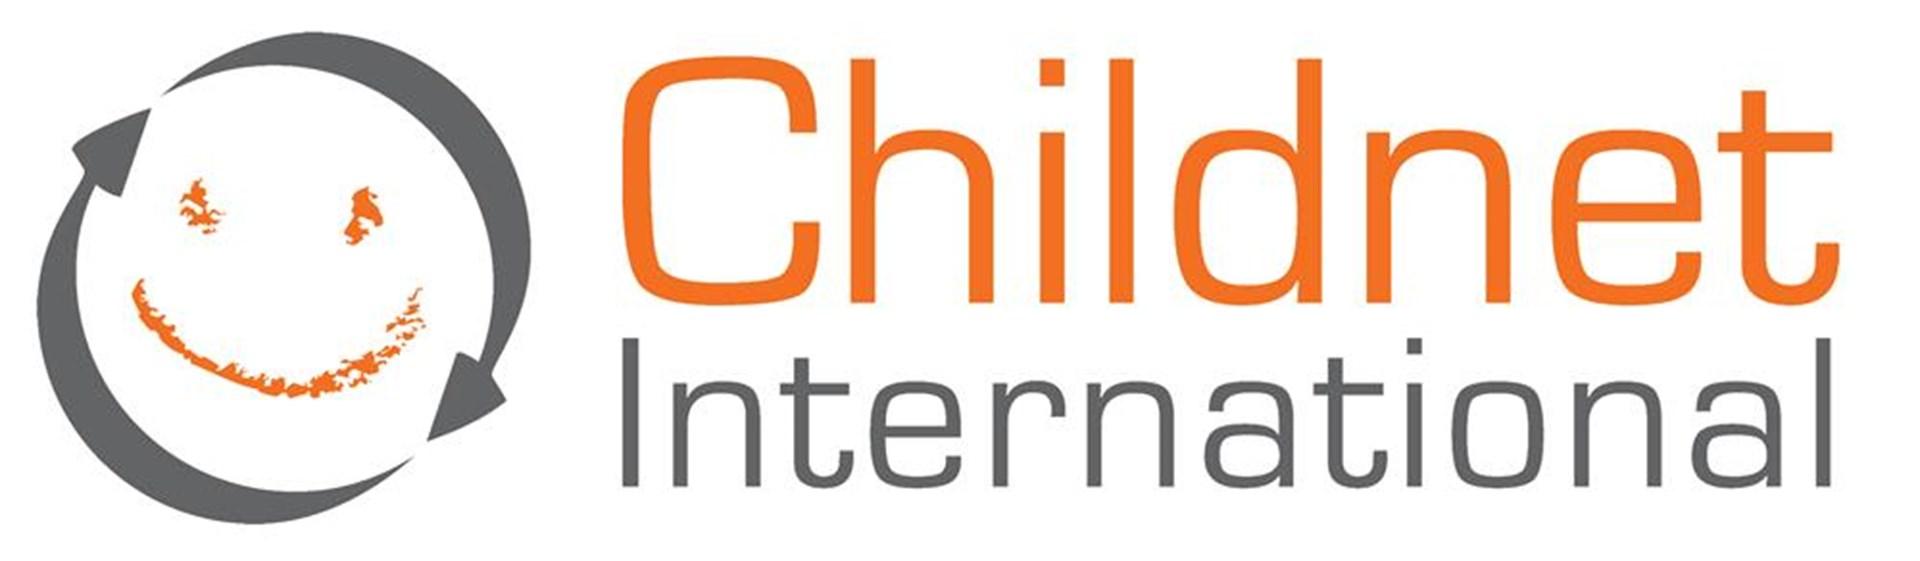 Image result for childnet international logo